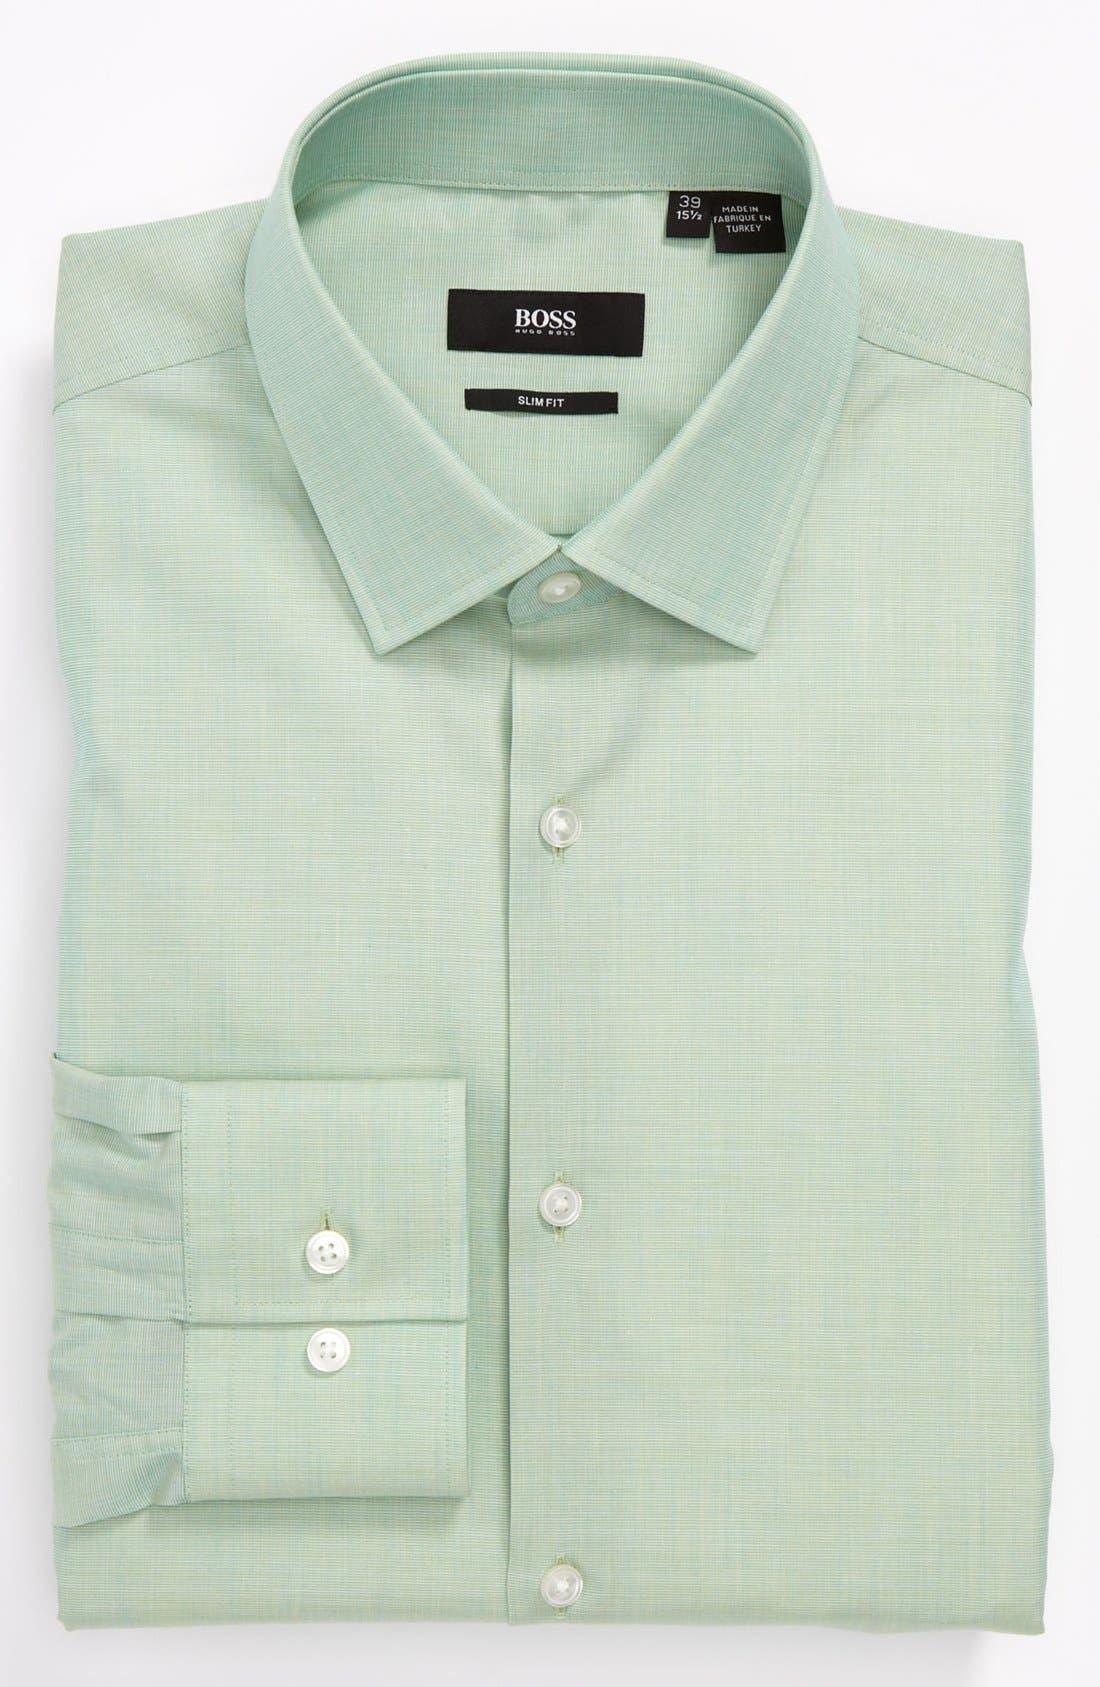 HUGO BOSS Slim Fit Dress Shirt,                         Main,                         color, 363